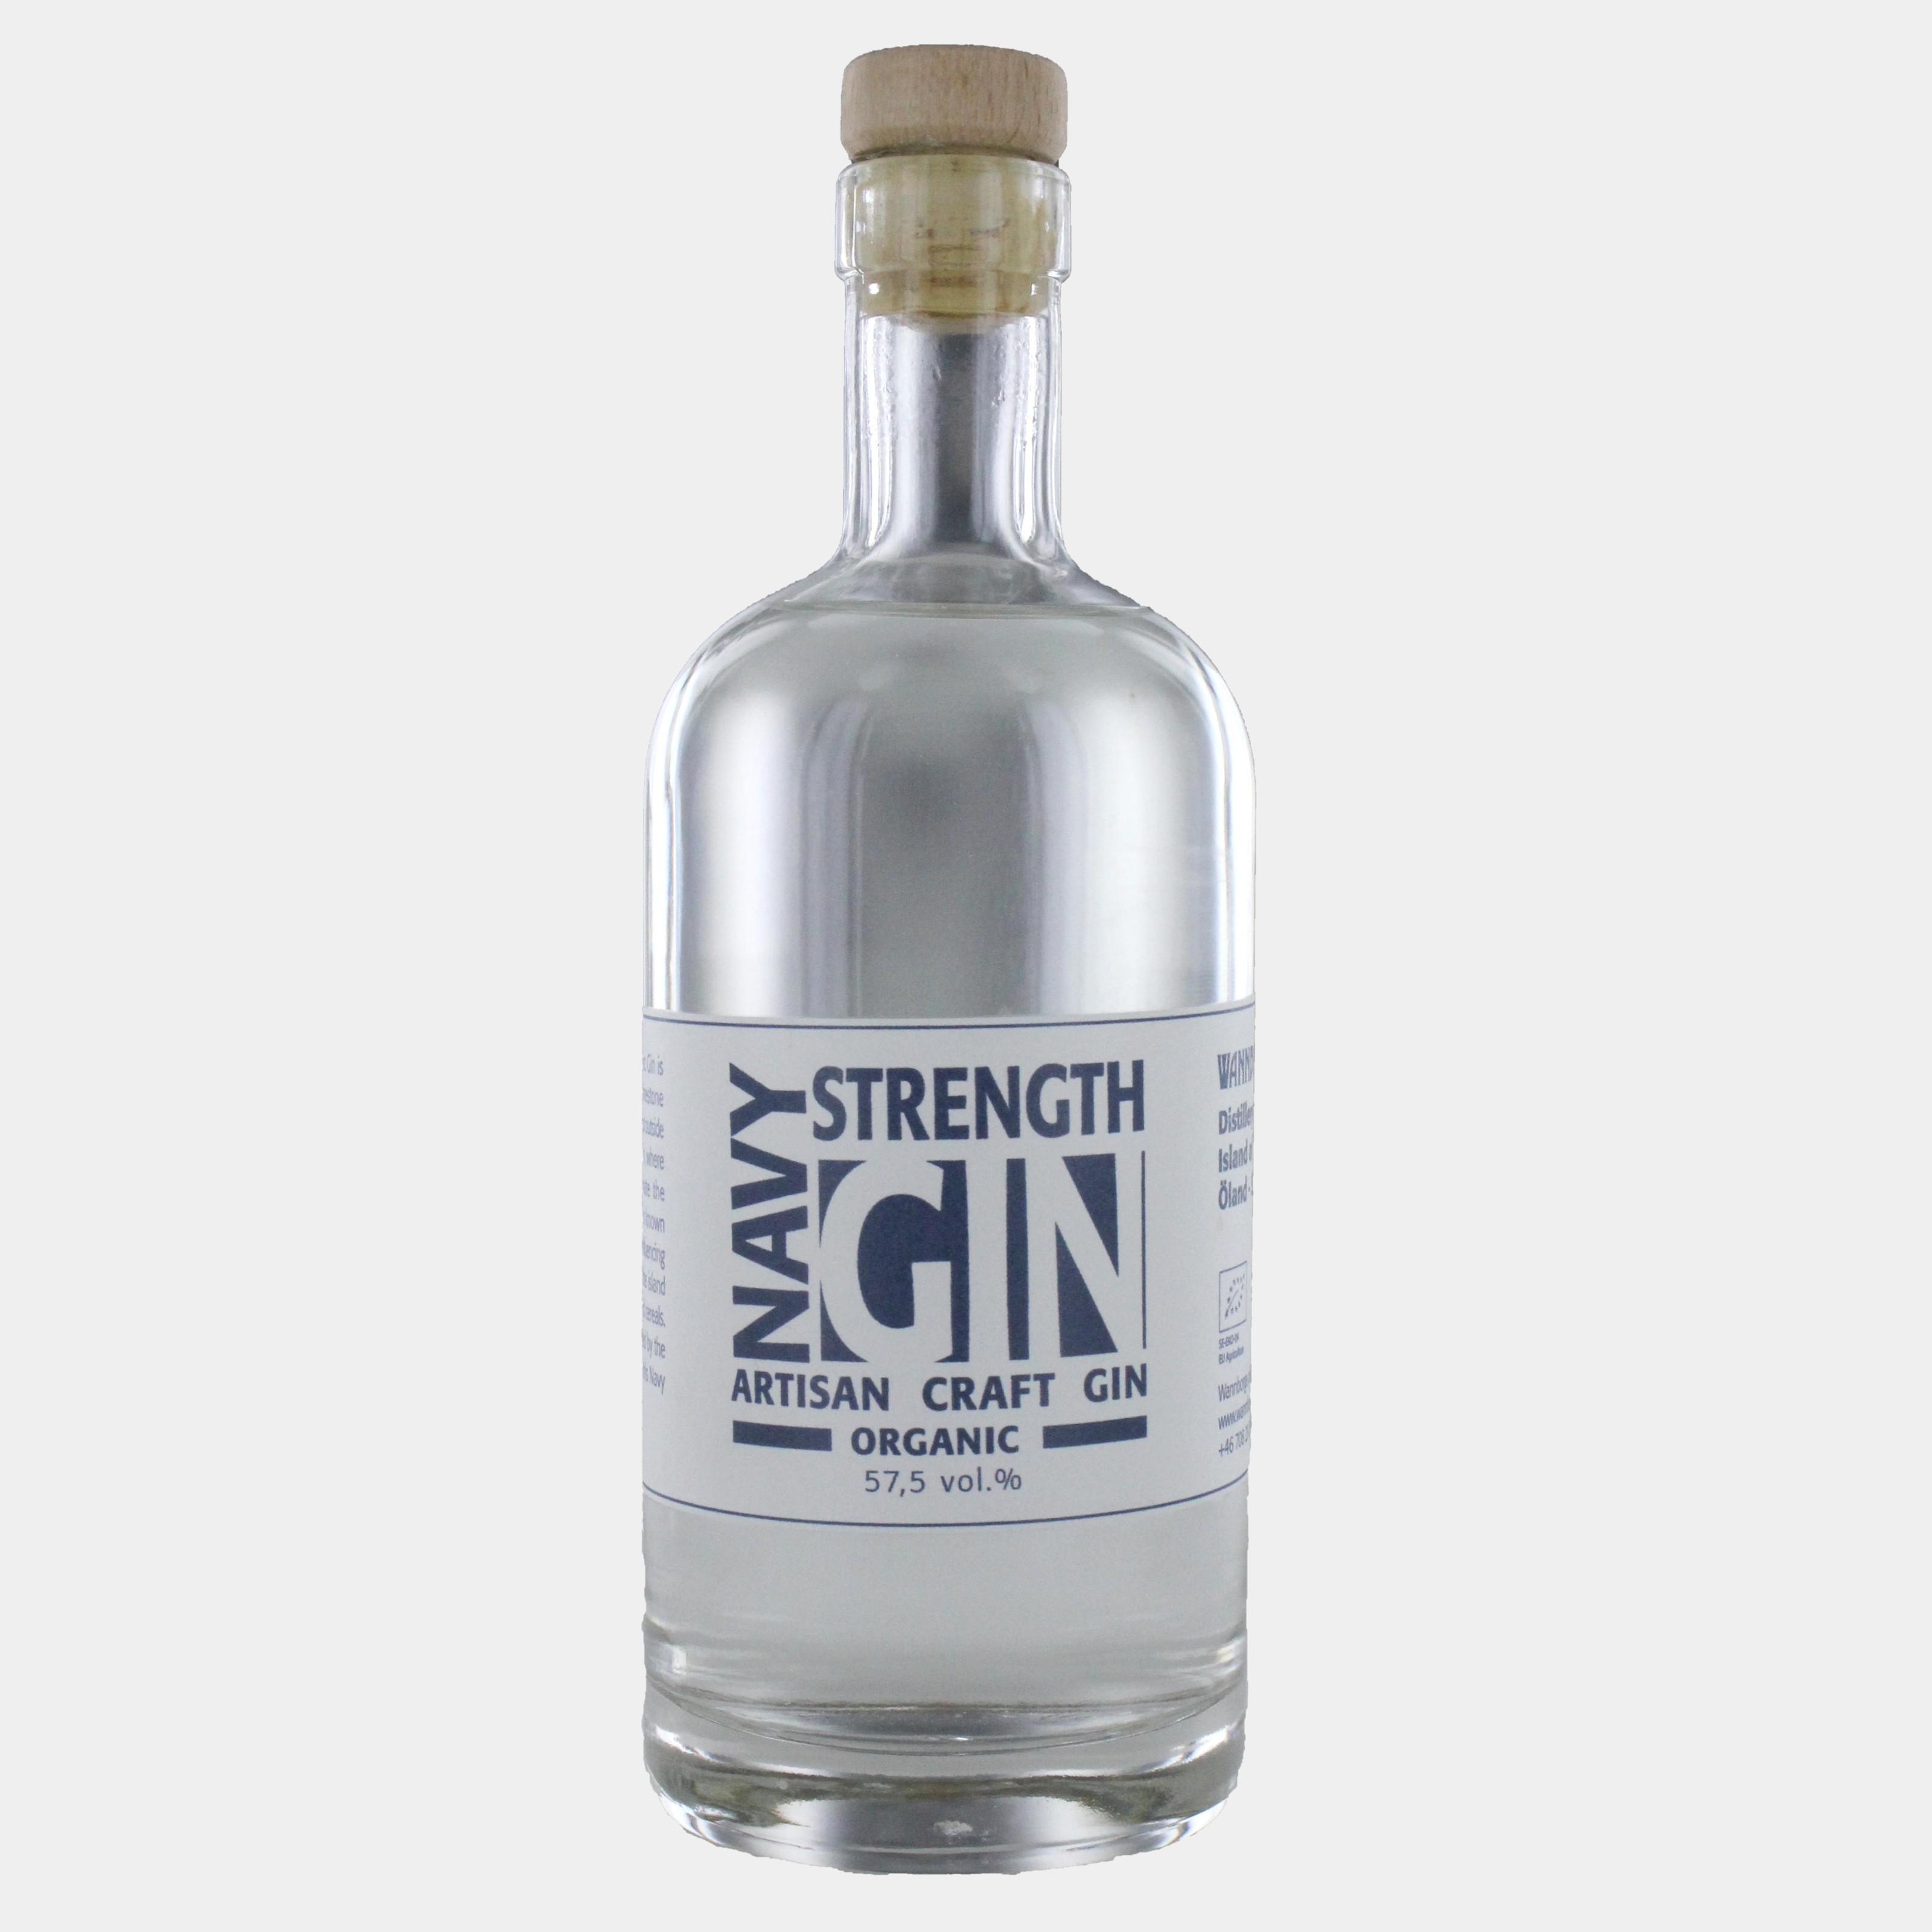 Wannborga Navy Strenght Gin 0.5 l 57,5% Alk - Ginobility